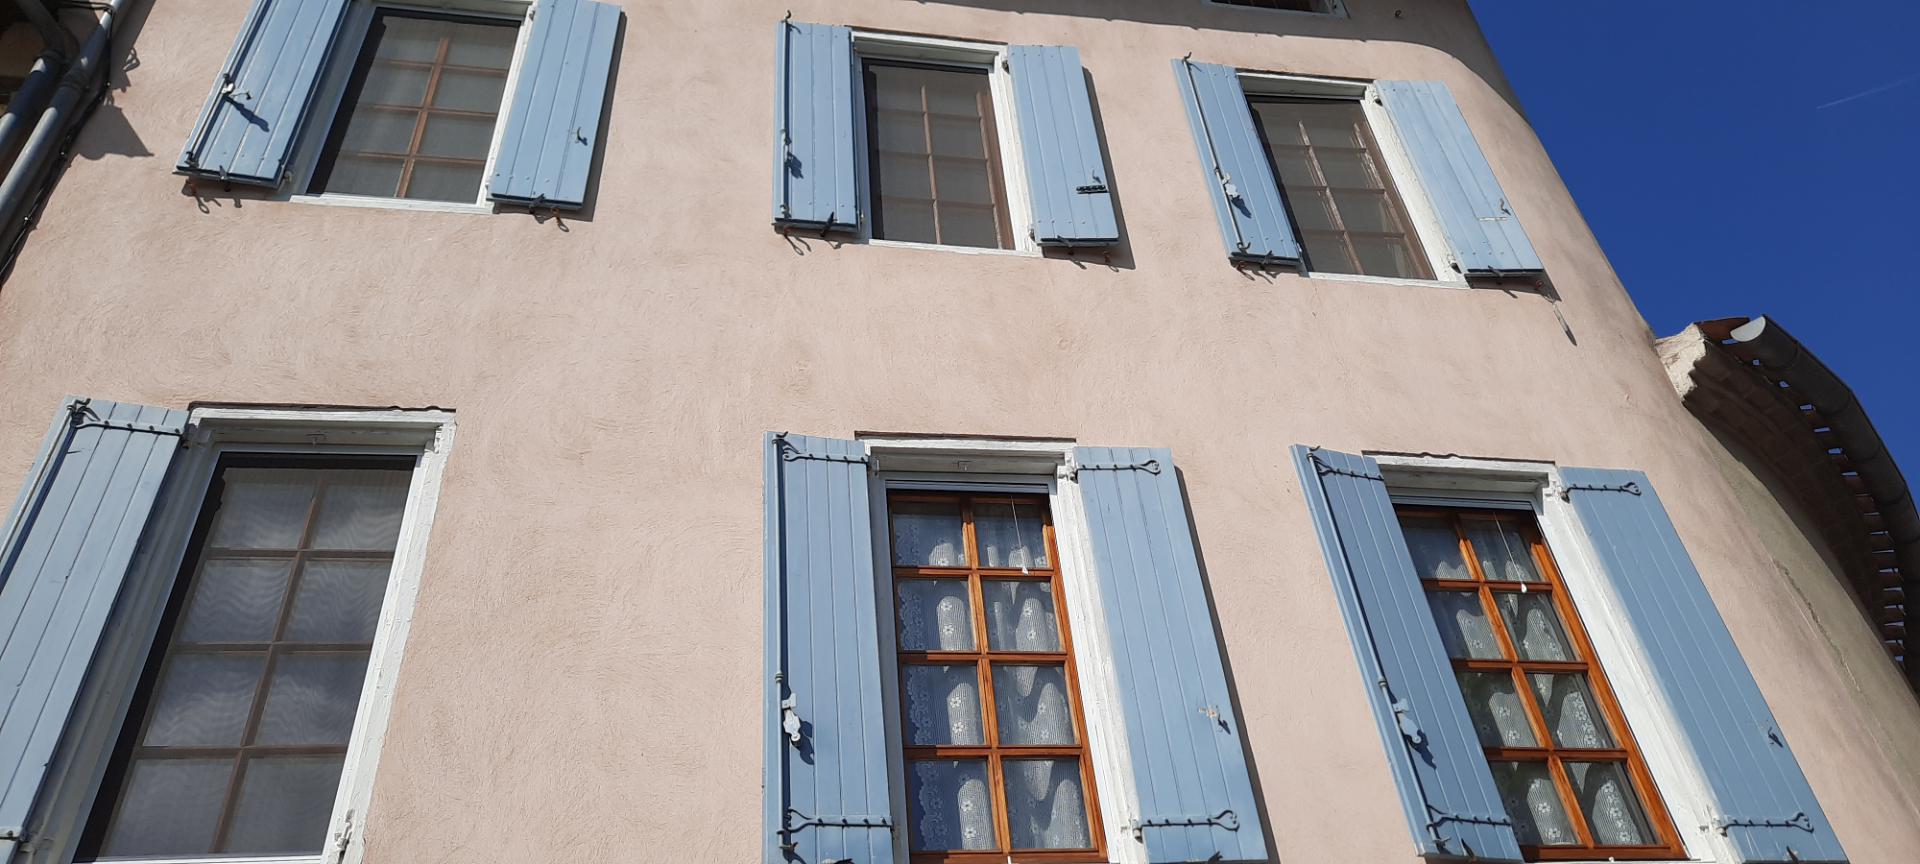 Vente Maison de 4 pièces 91 m² - CASTELNAUDARY 11400 | IMOGROUP CASTELNAUDARY - IMOGROUP photo1